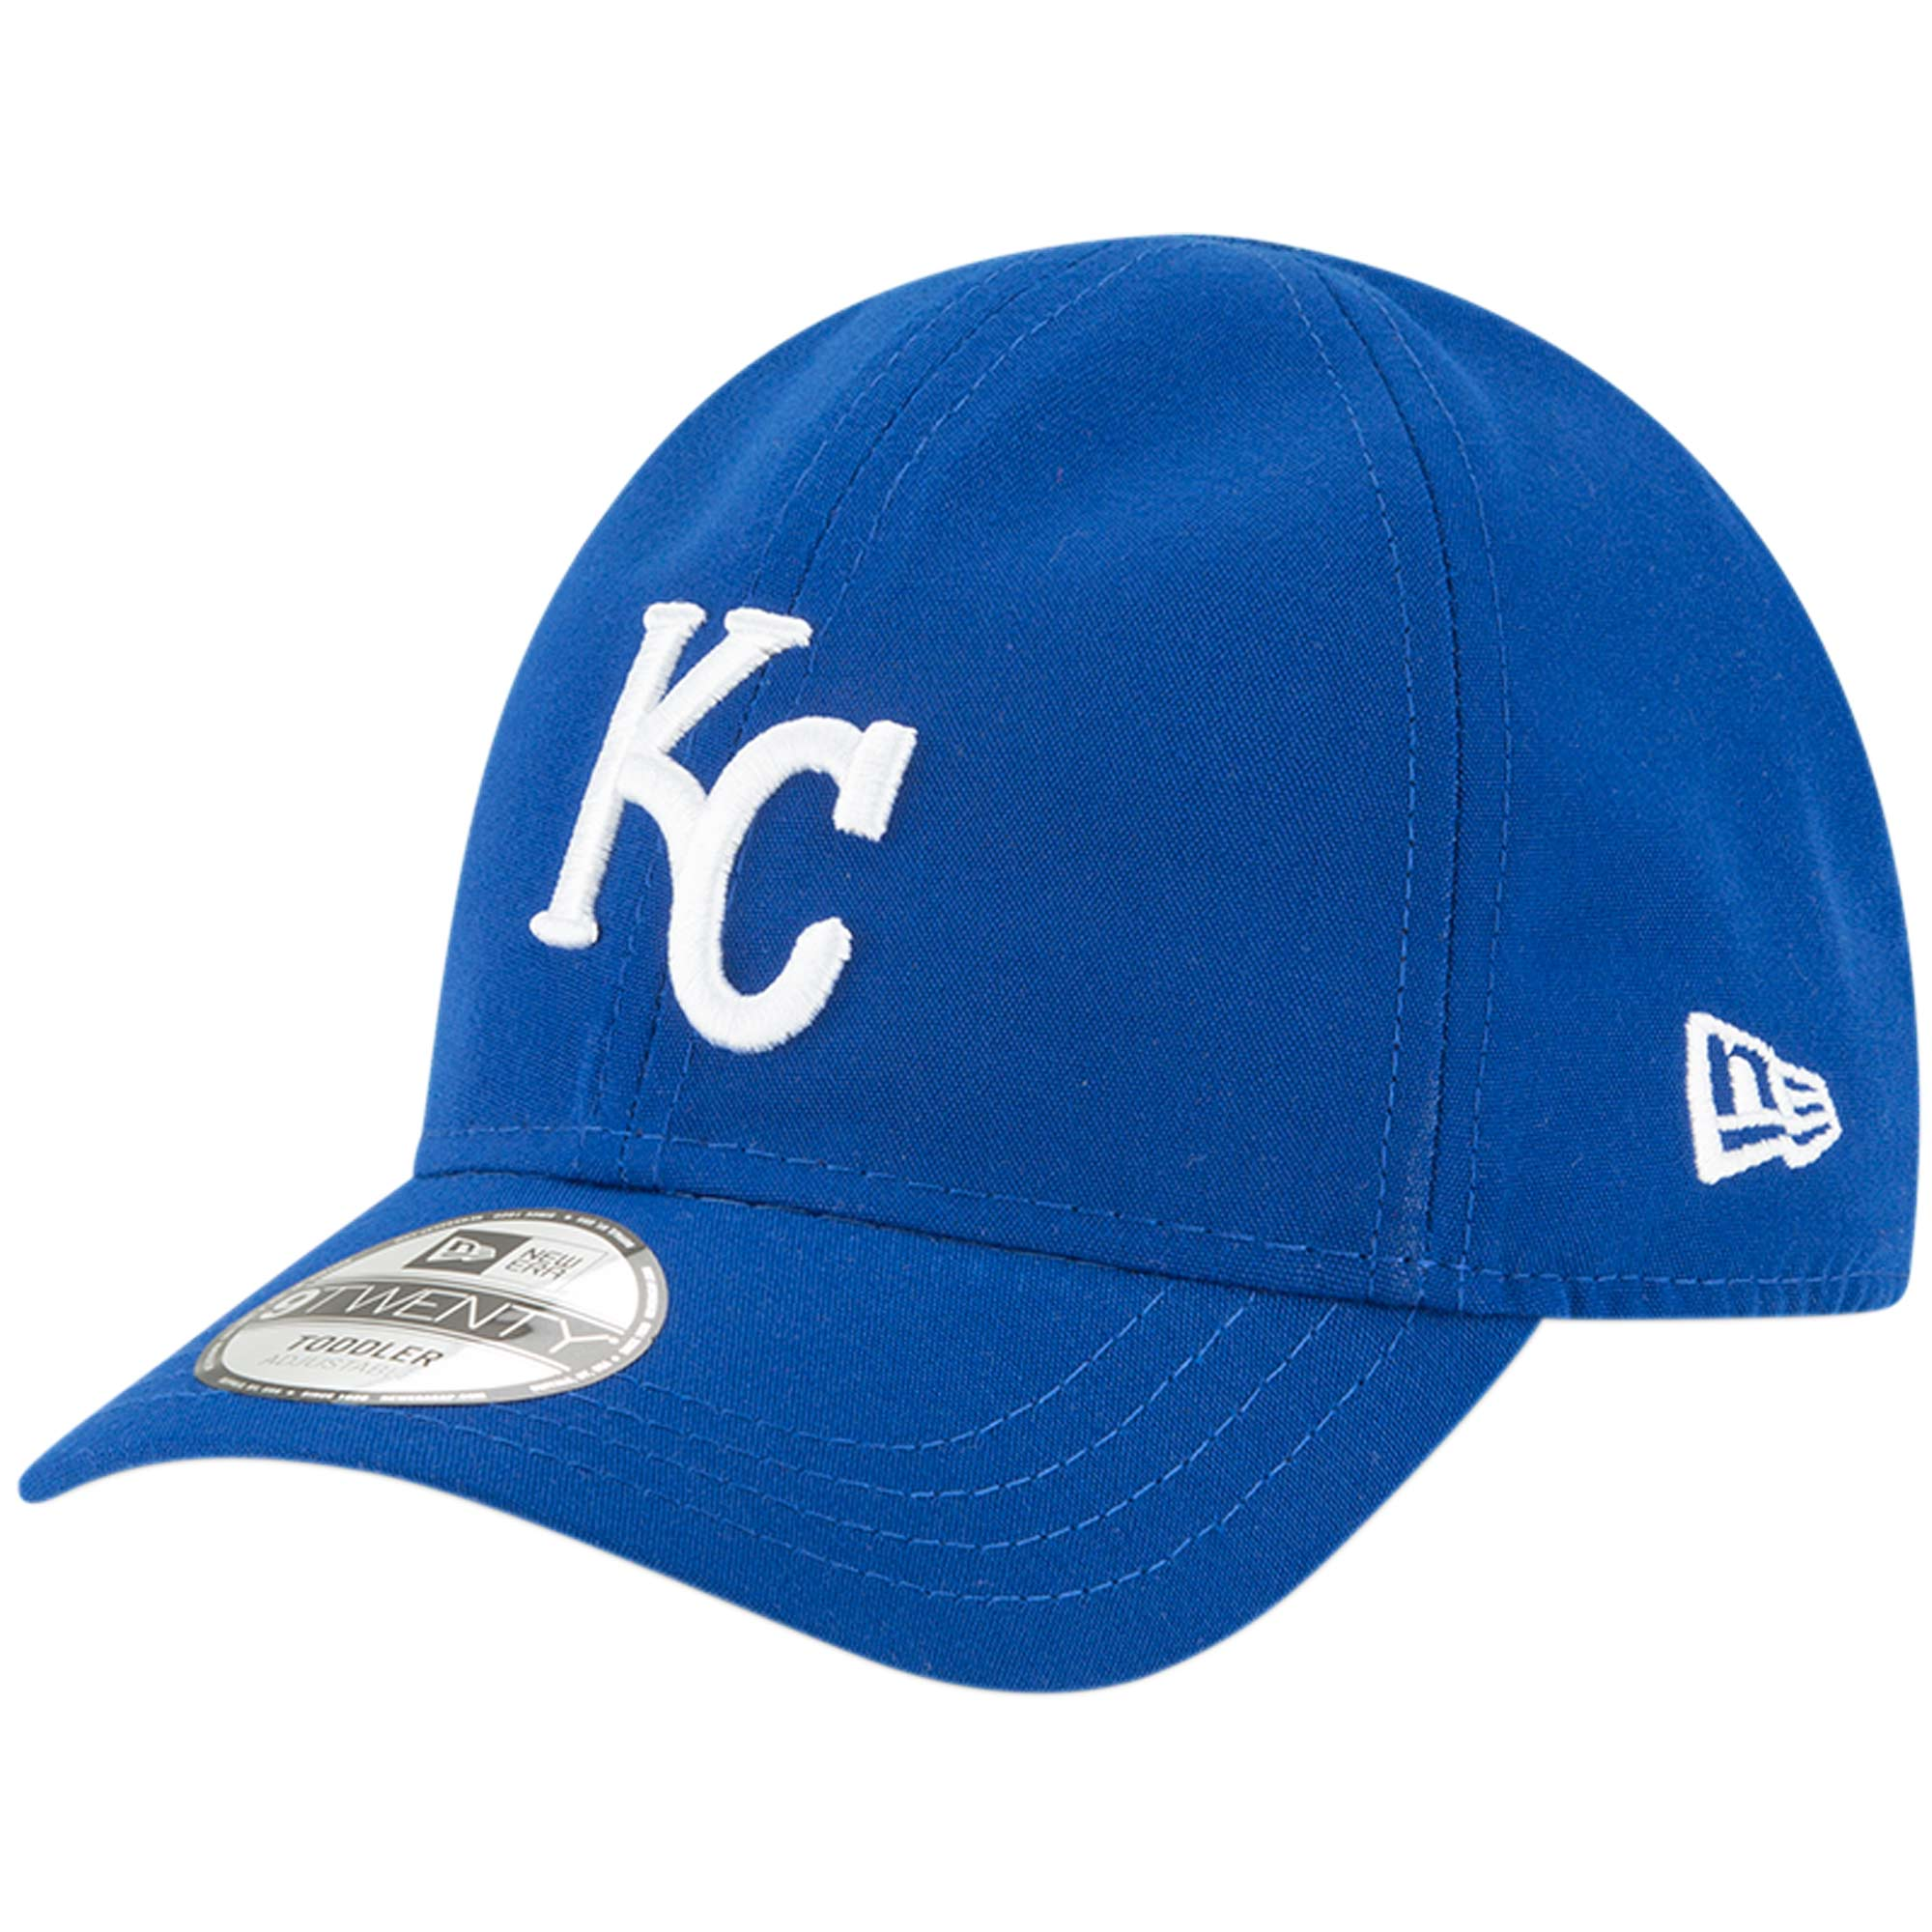 Kansas City Royals New Era Toddler My 1st 9TWENTY Adjustable Hat - Royal - OSFA